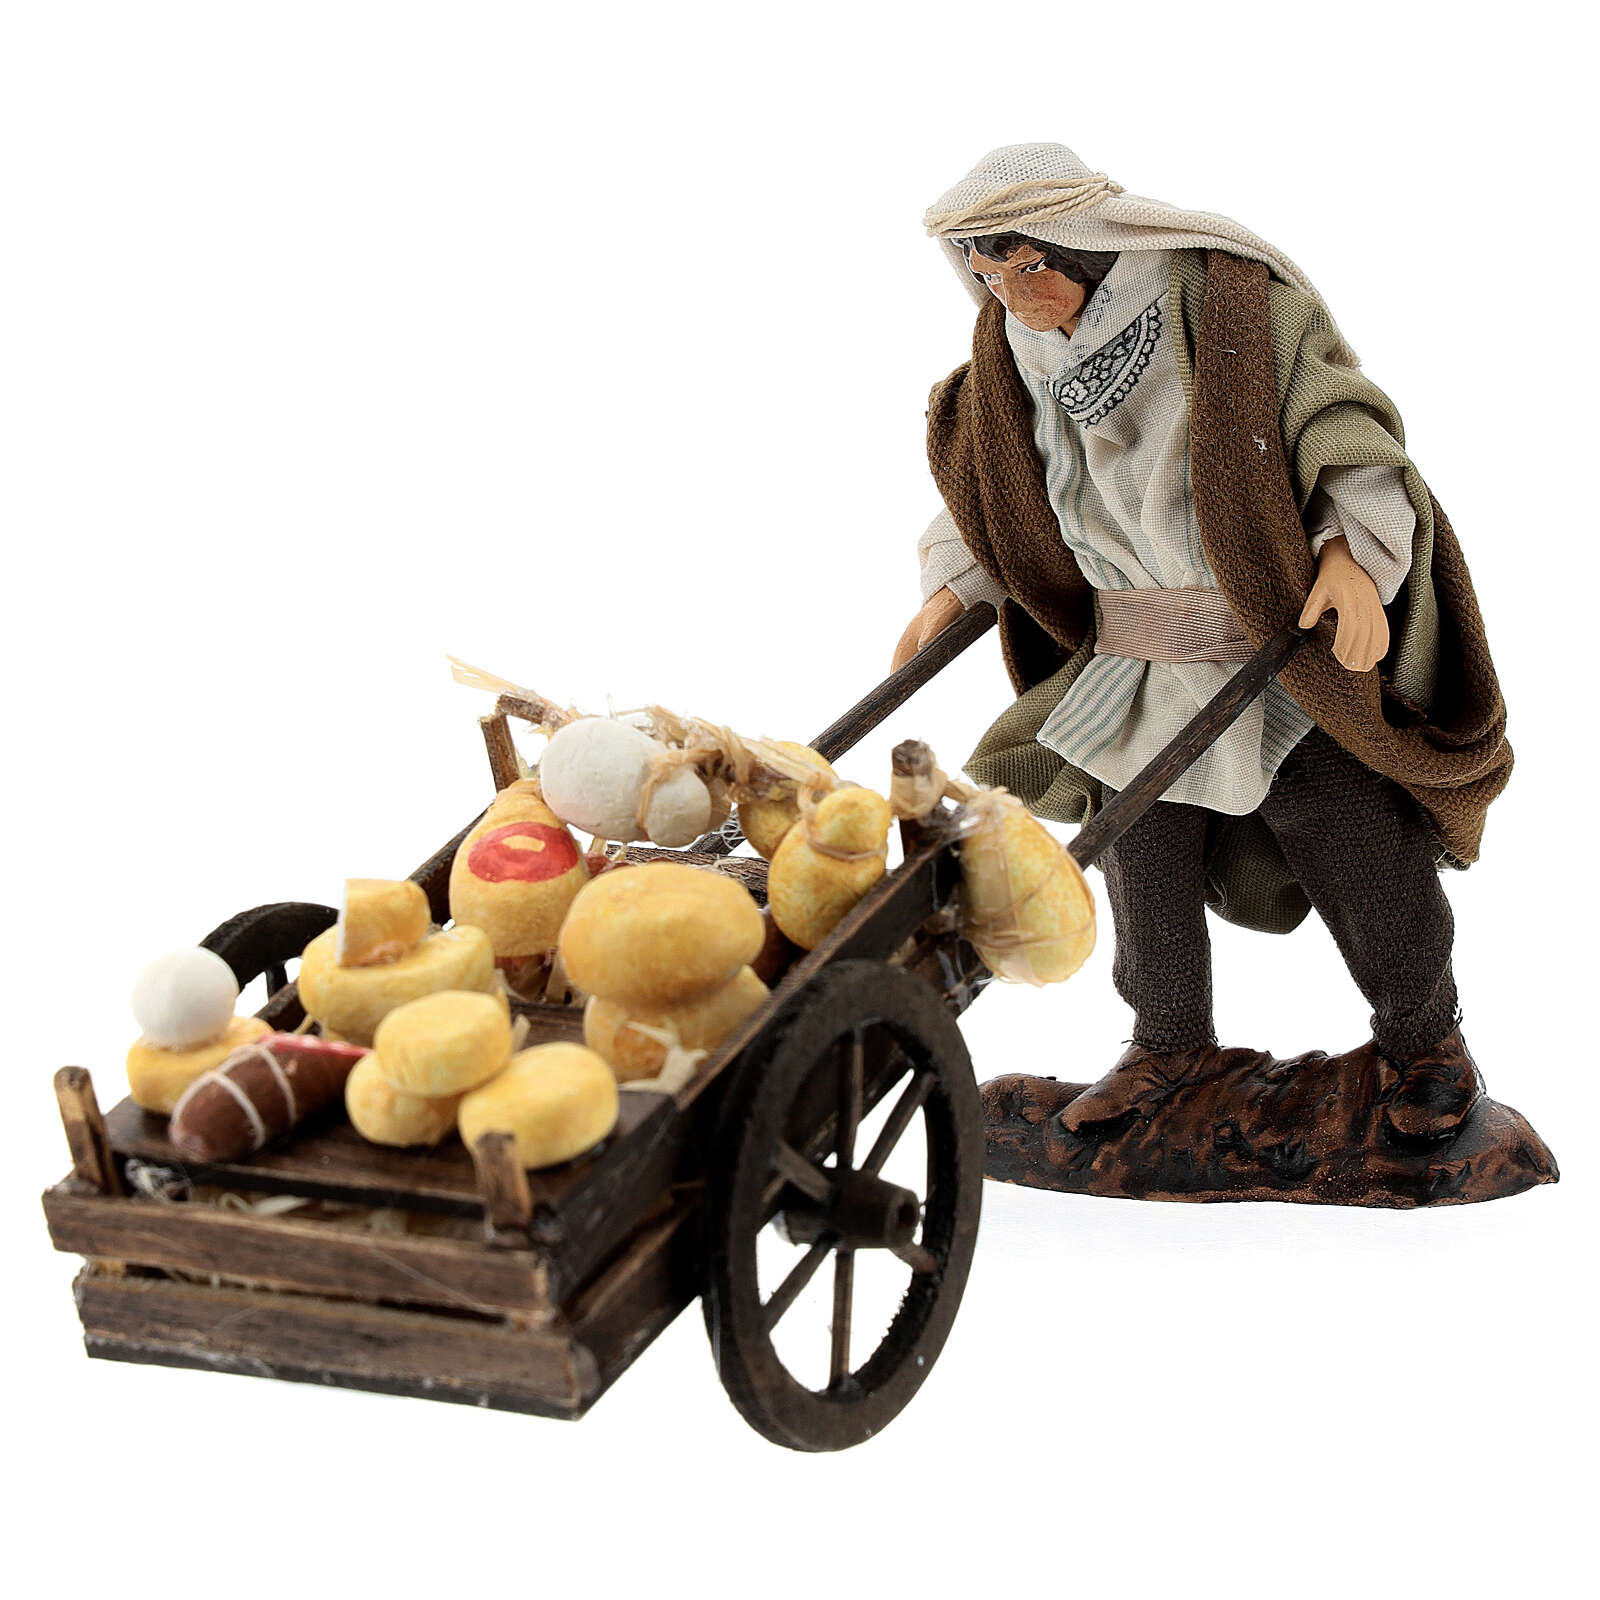 Merchant with salami cheese cart, 12 cm Neapolitan nativity figurine 4